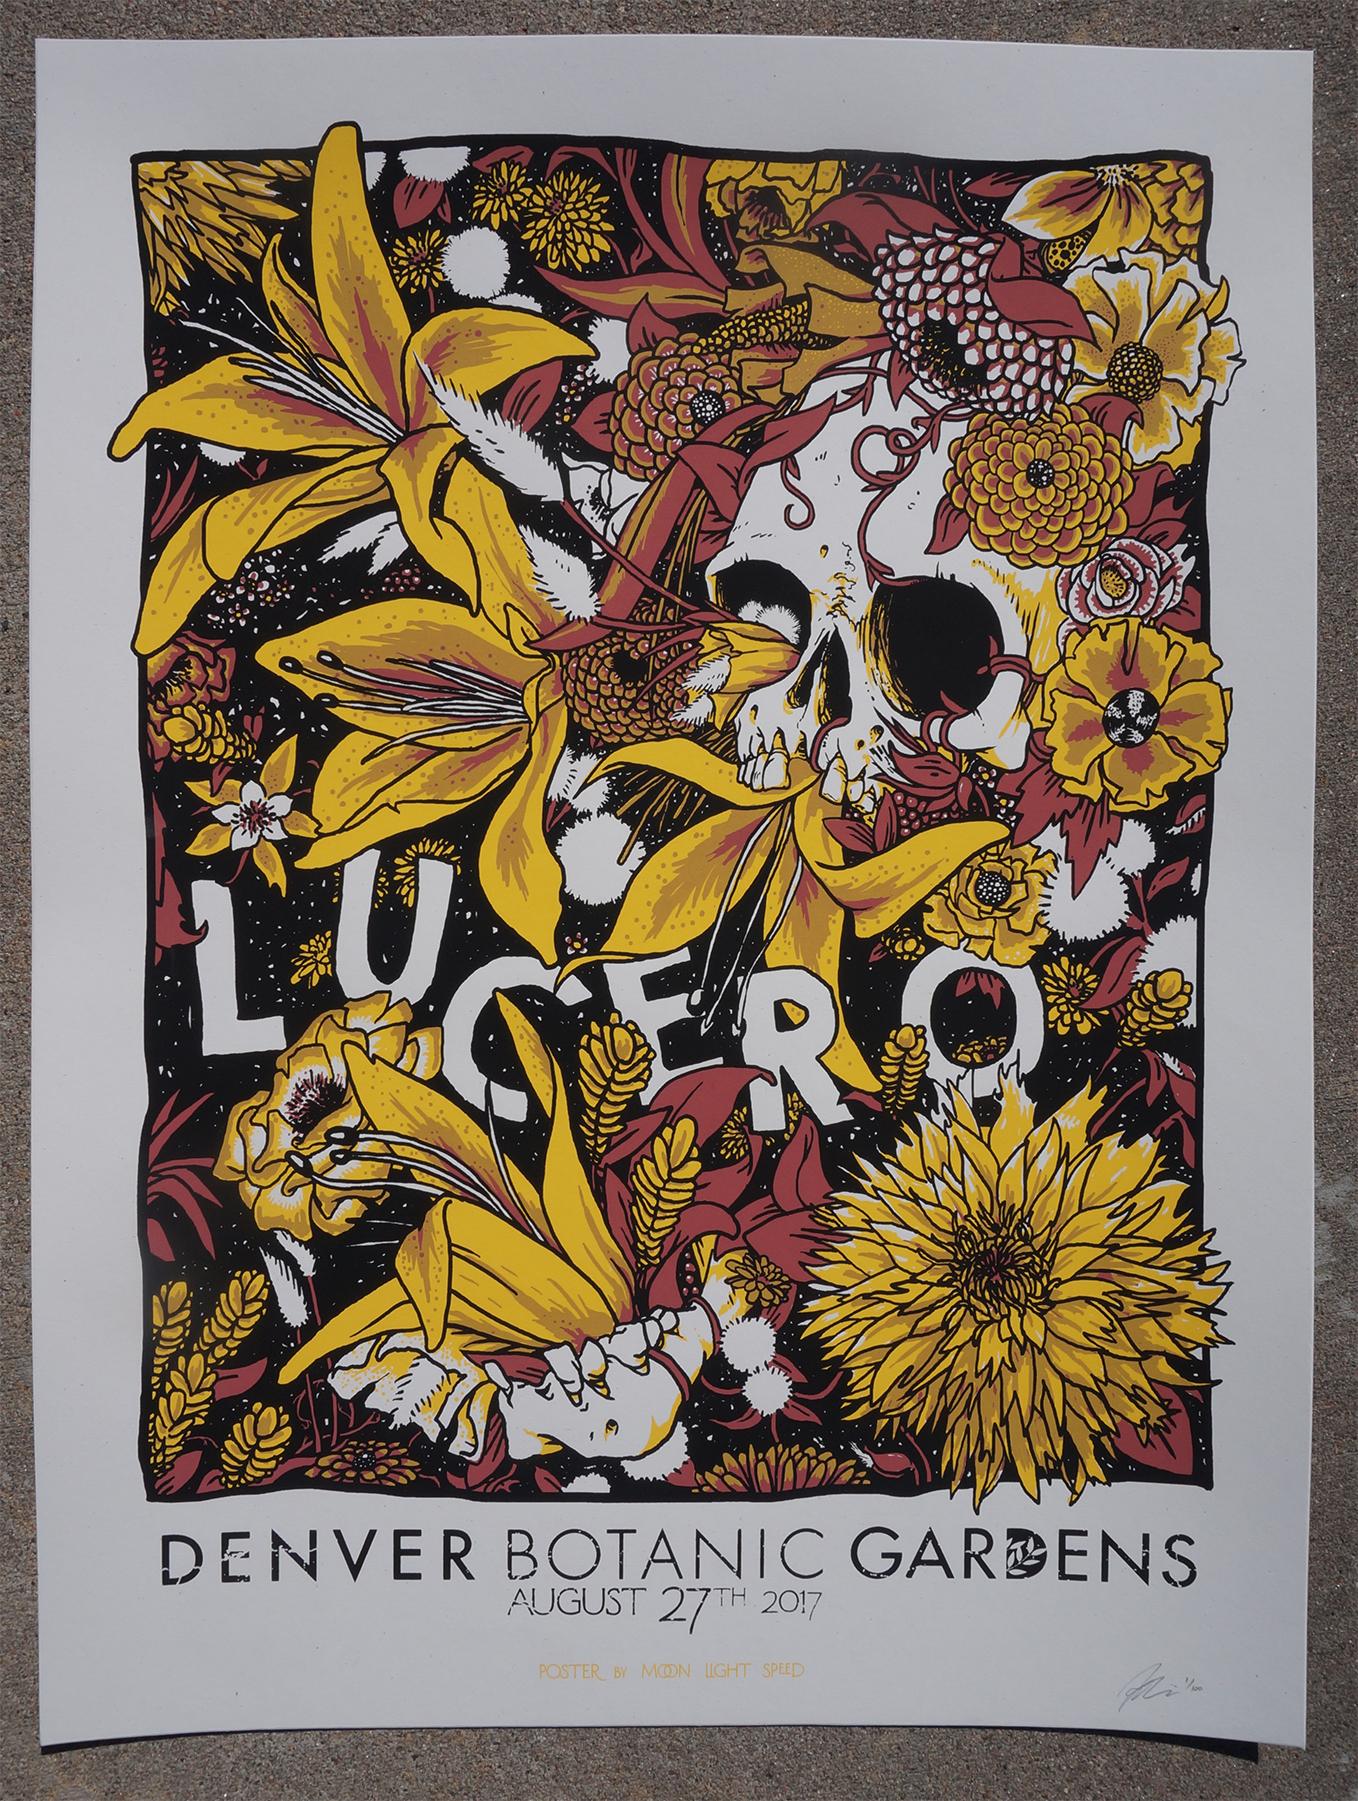 Lucero The Denver Botanic Gardens · Moon Light Speed · line